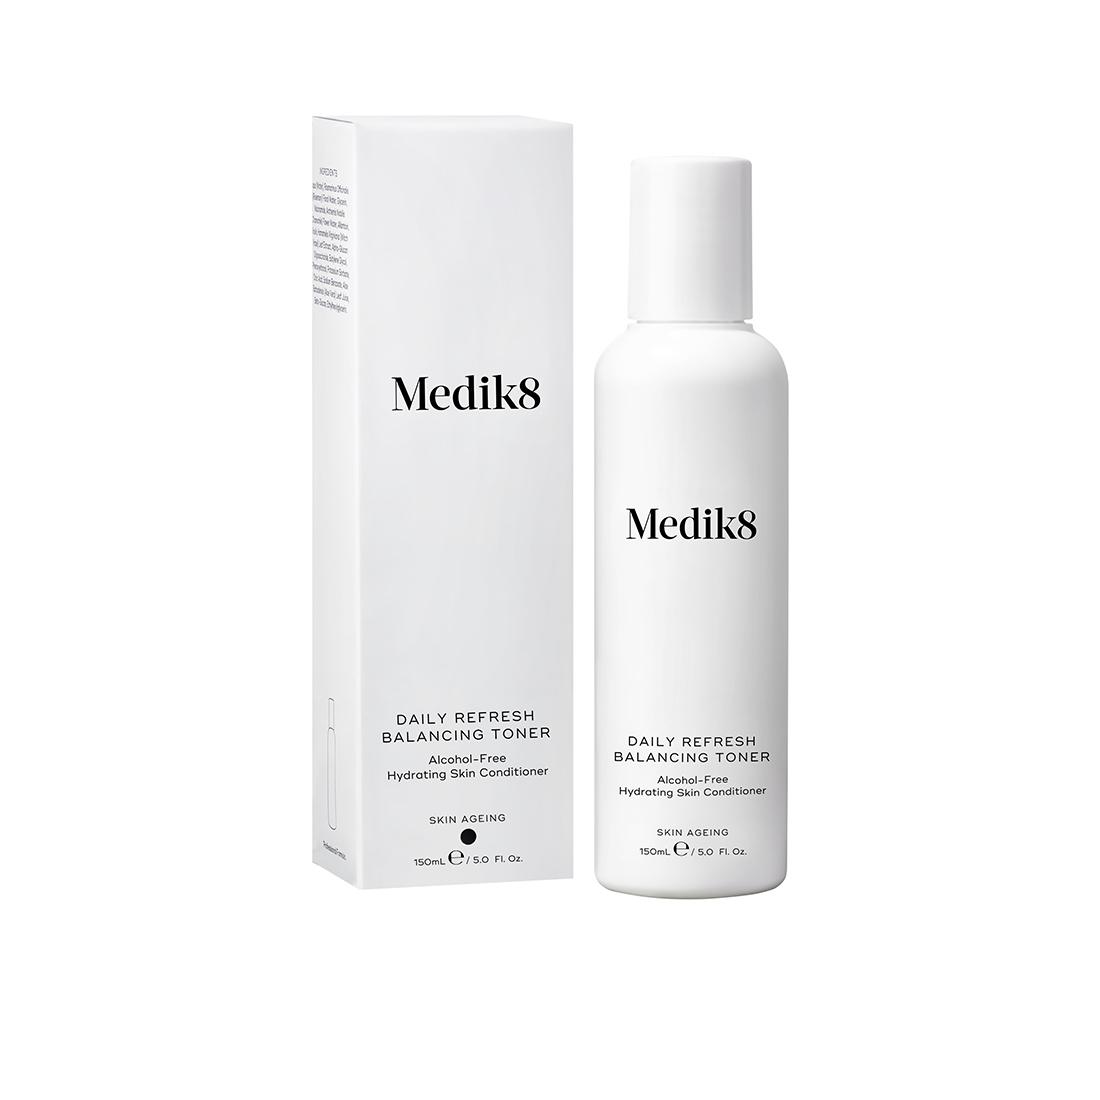 Medik8 Pore Refining Toner 150 ml